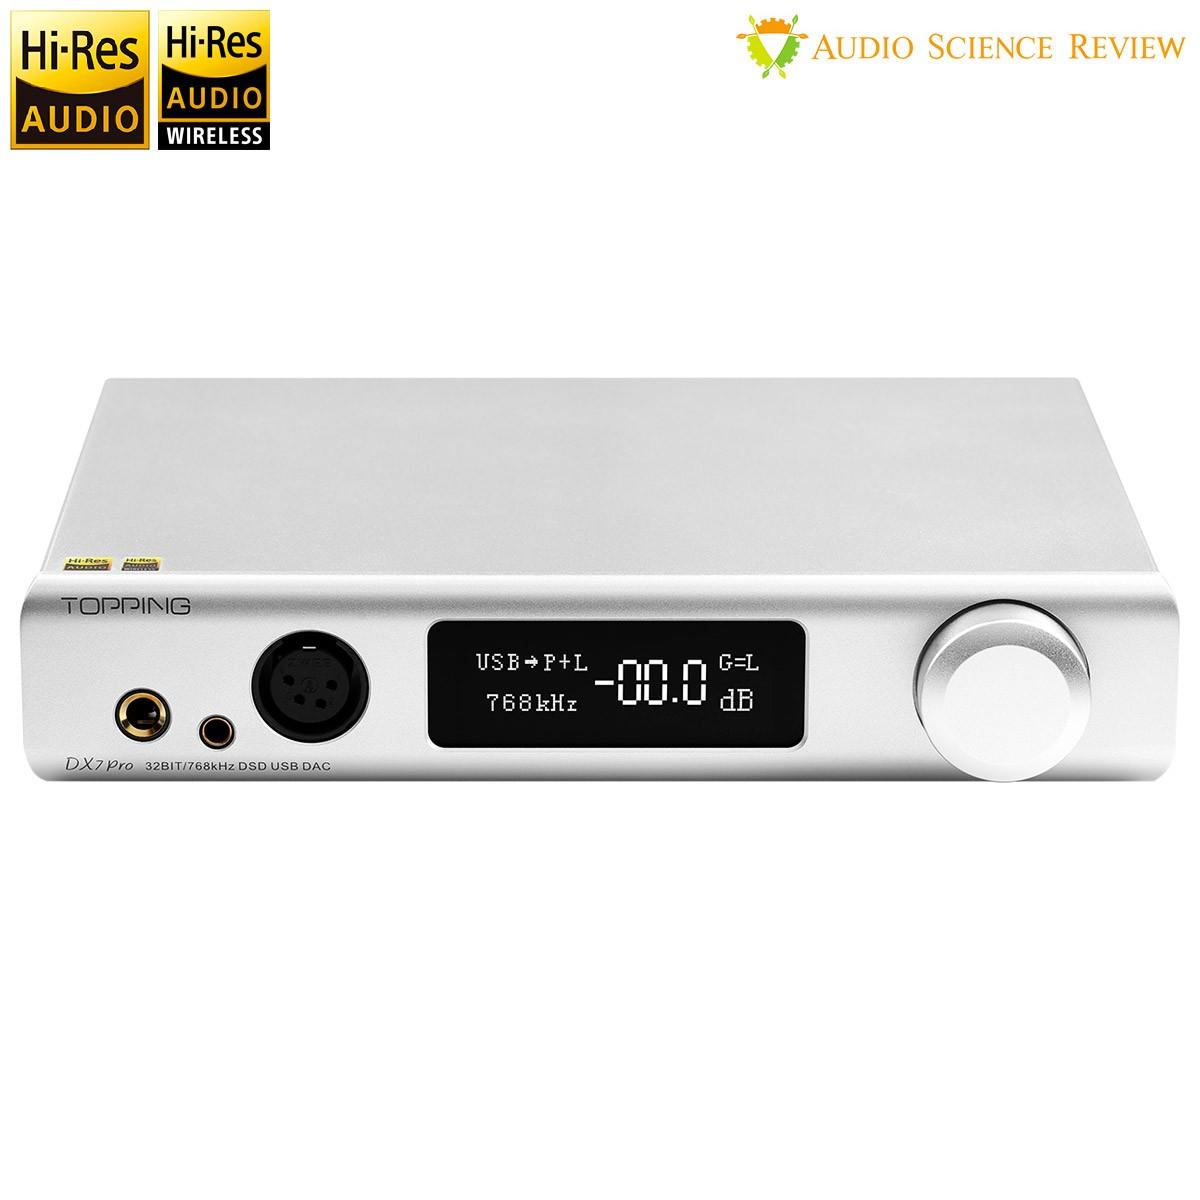 TOPPING DX7 PRO Balanced DAC Headphone Amplifier ES9038Pro Bluetooth 5.0 aptX HD LDAC 32bit 768kHz DSD1024 Silver